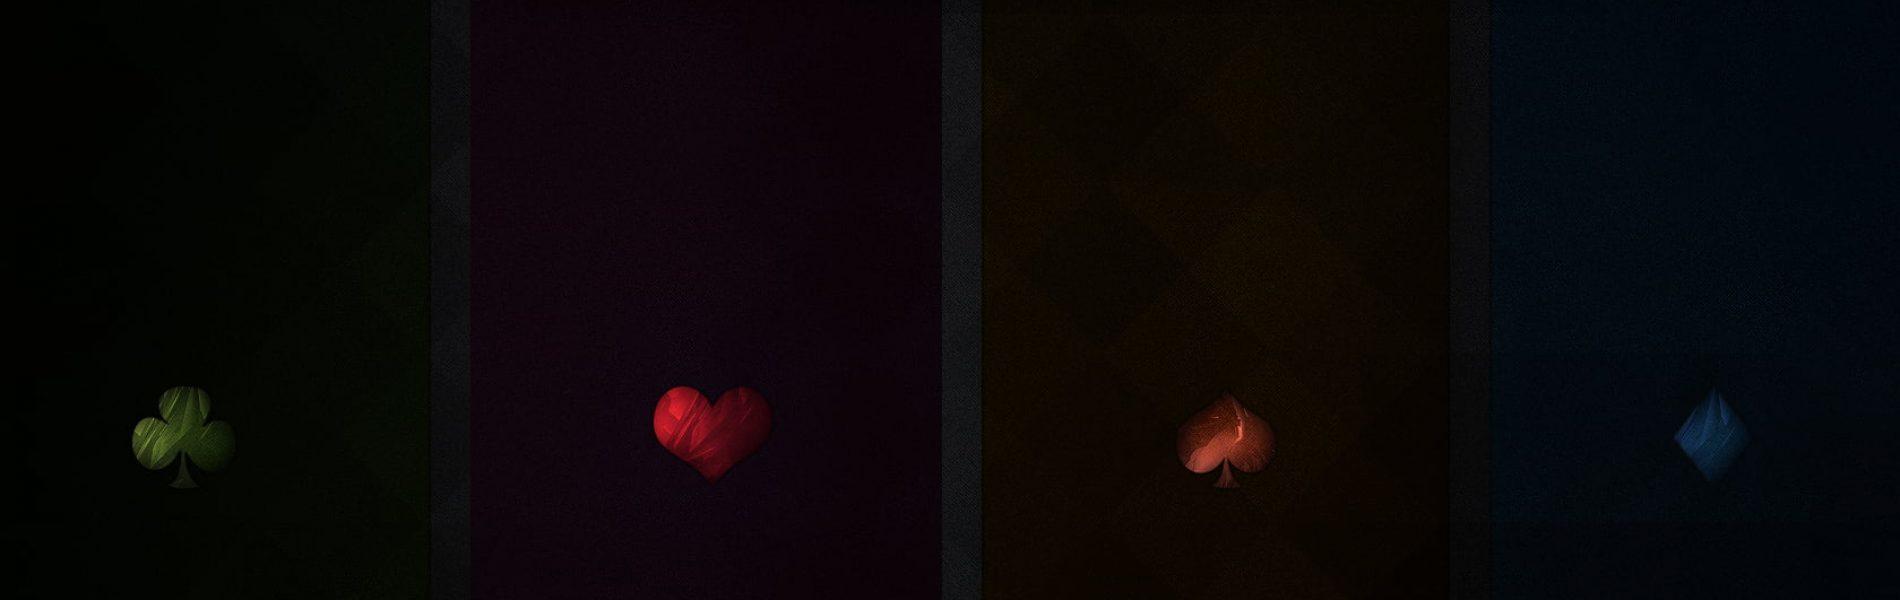 cropped-poker-video-games-heart-spades-wallpaper.jpg